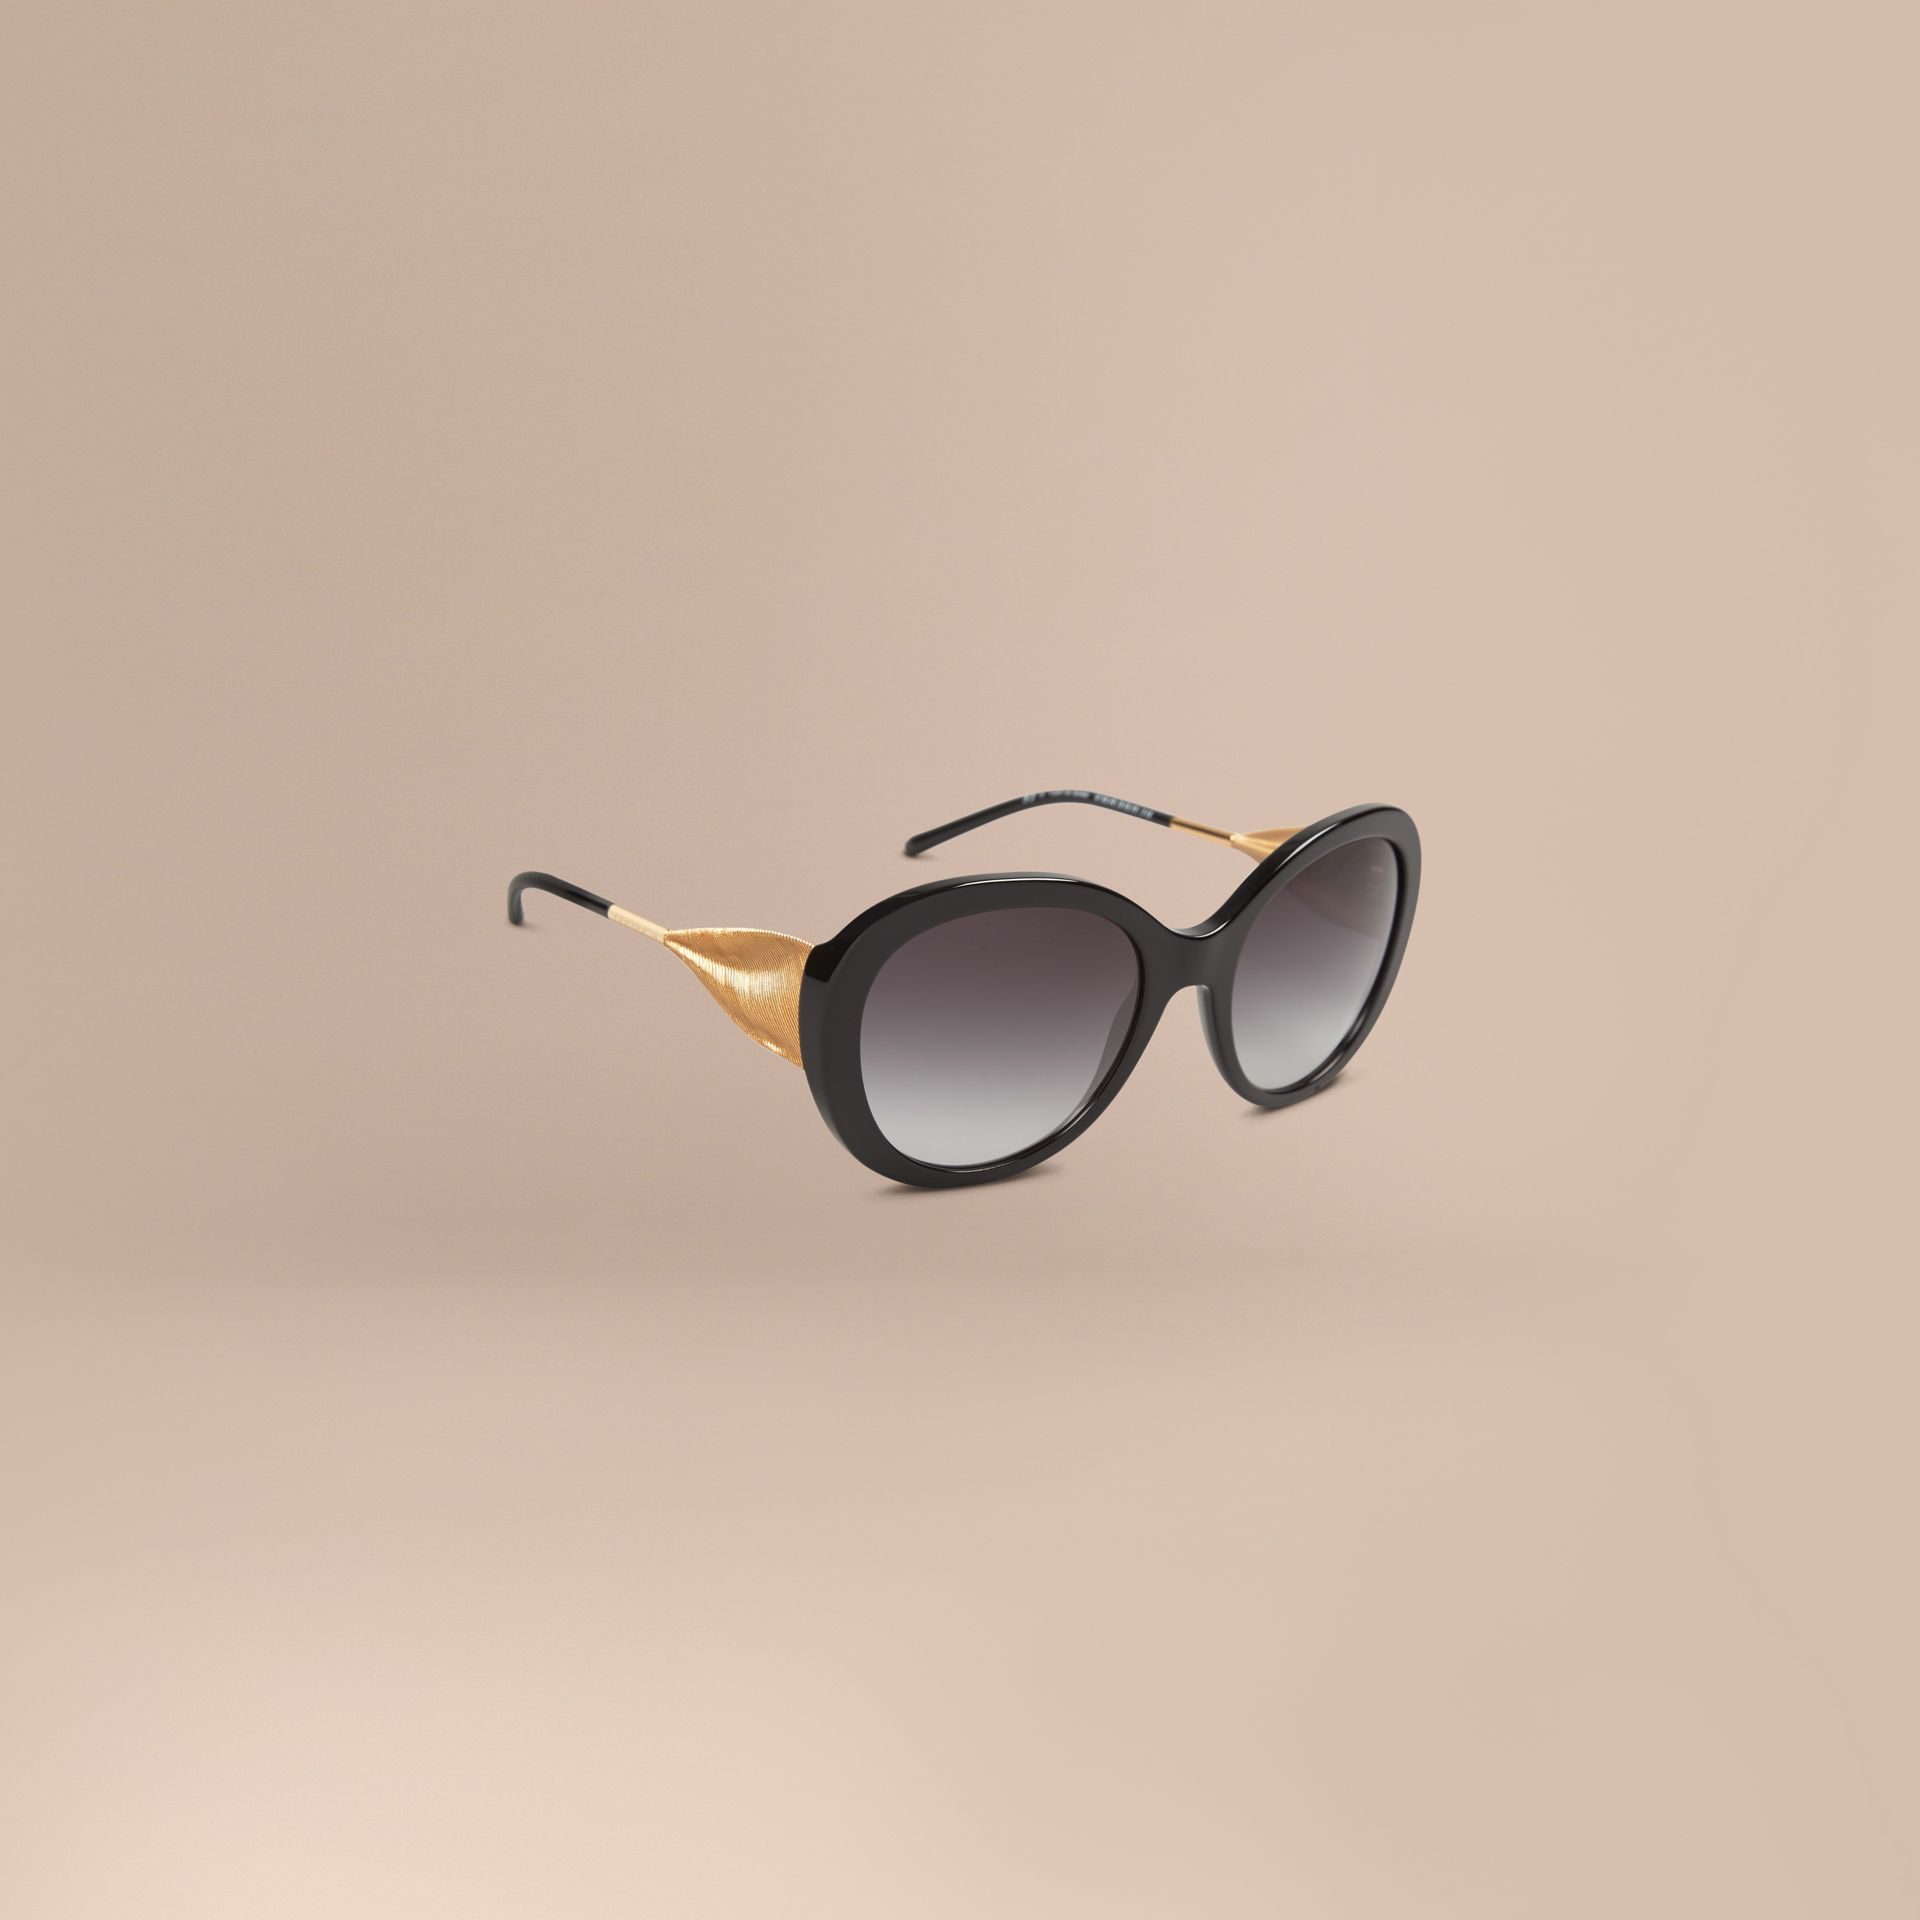 Black Oversize Round Frame Sunglasses Black - gallery image 1